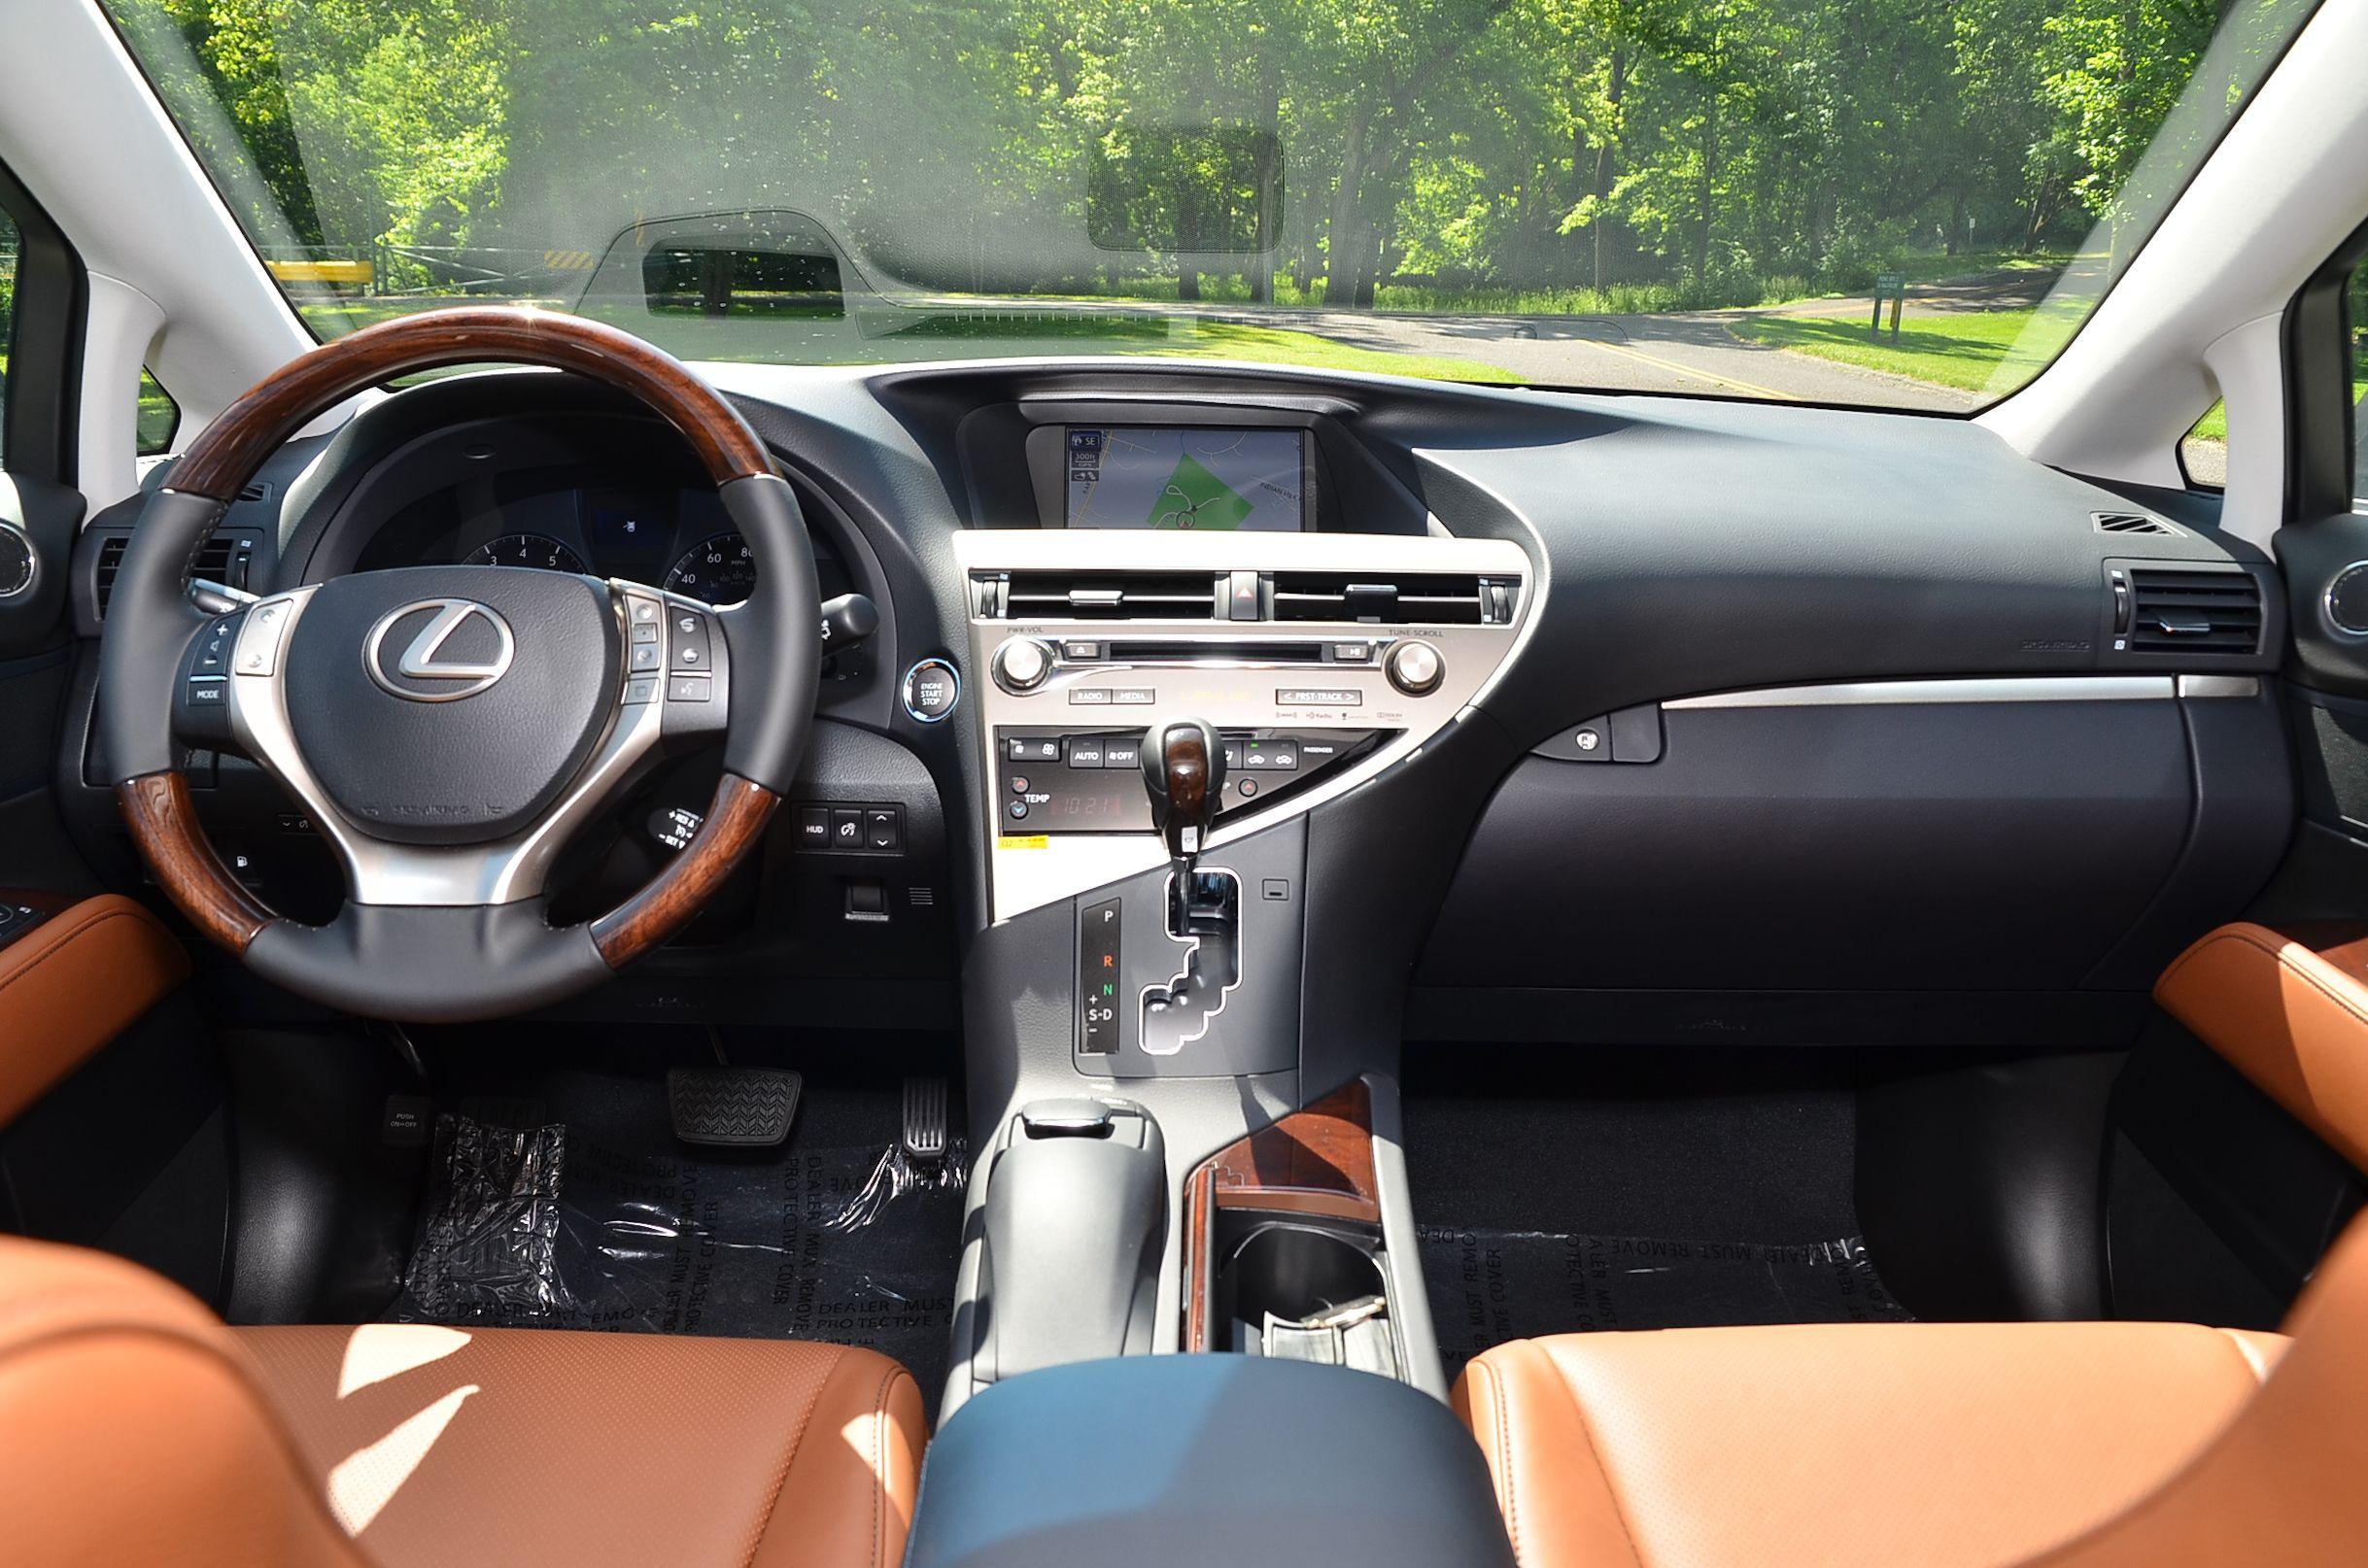 photos price drive wheel photo front base reviews rx features suv lexus